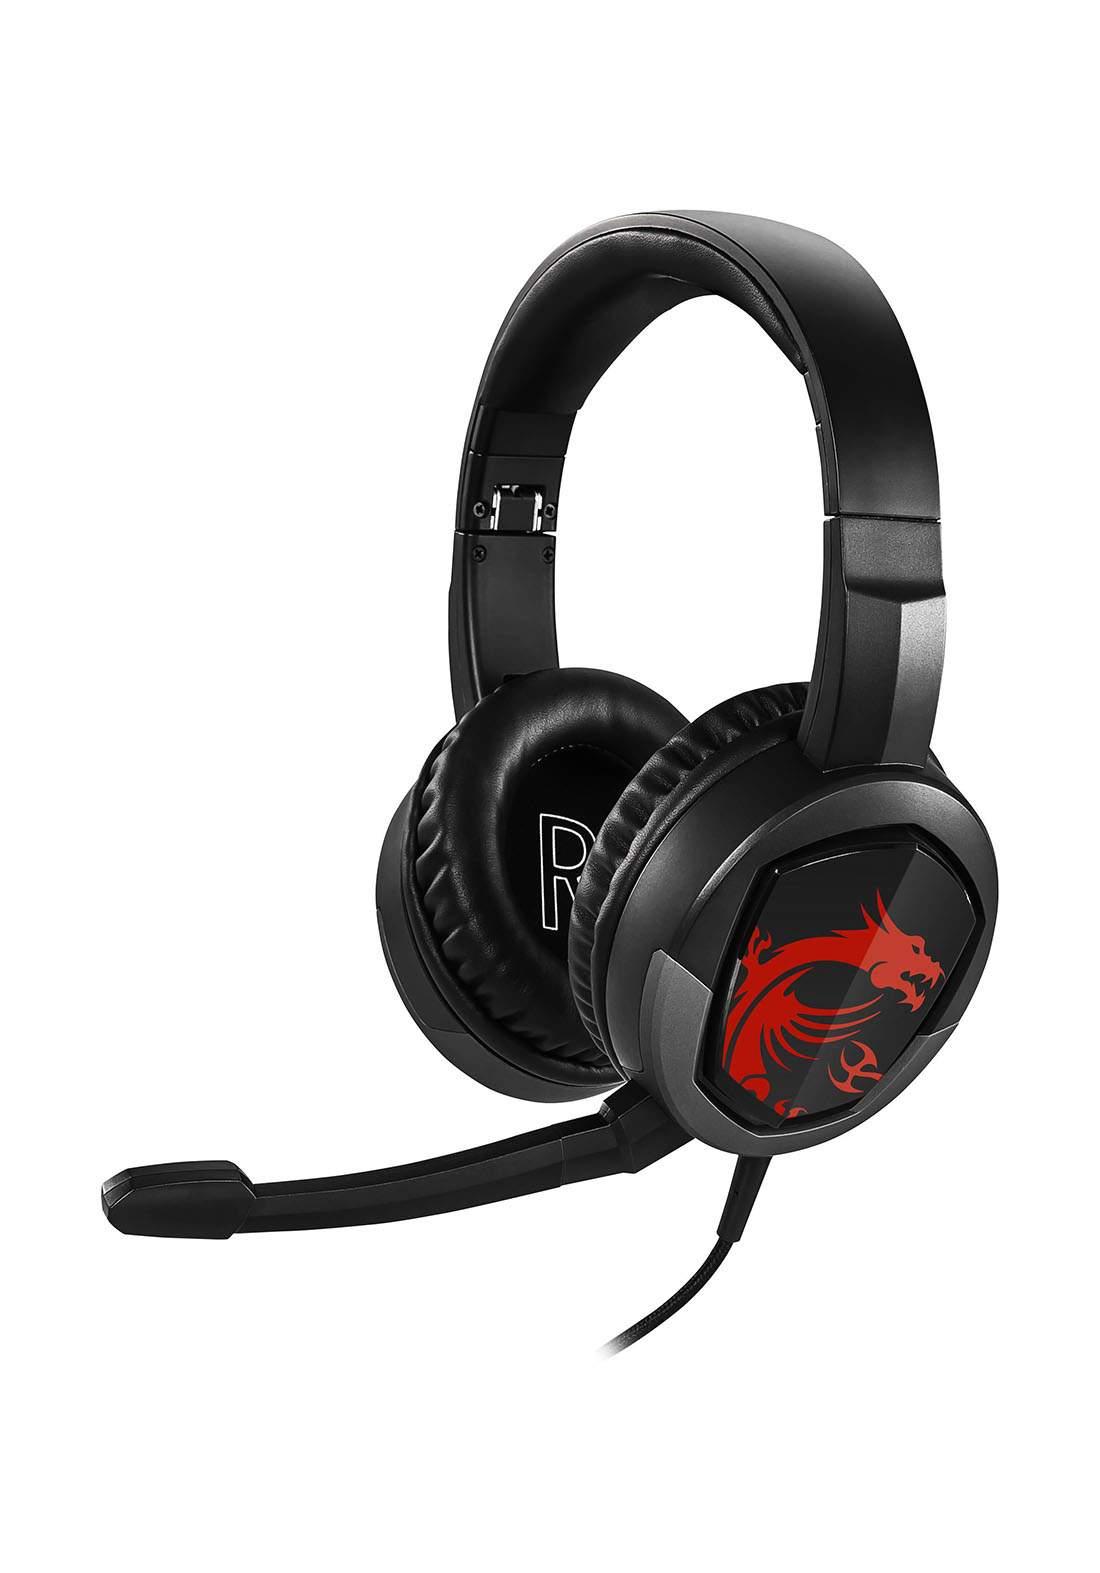 MSI GH30 Wired Gaming Headset - Black سماعة سلكية